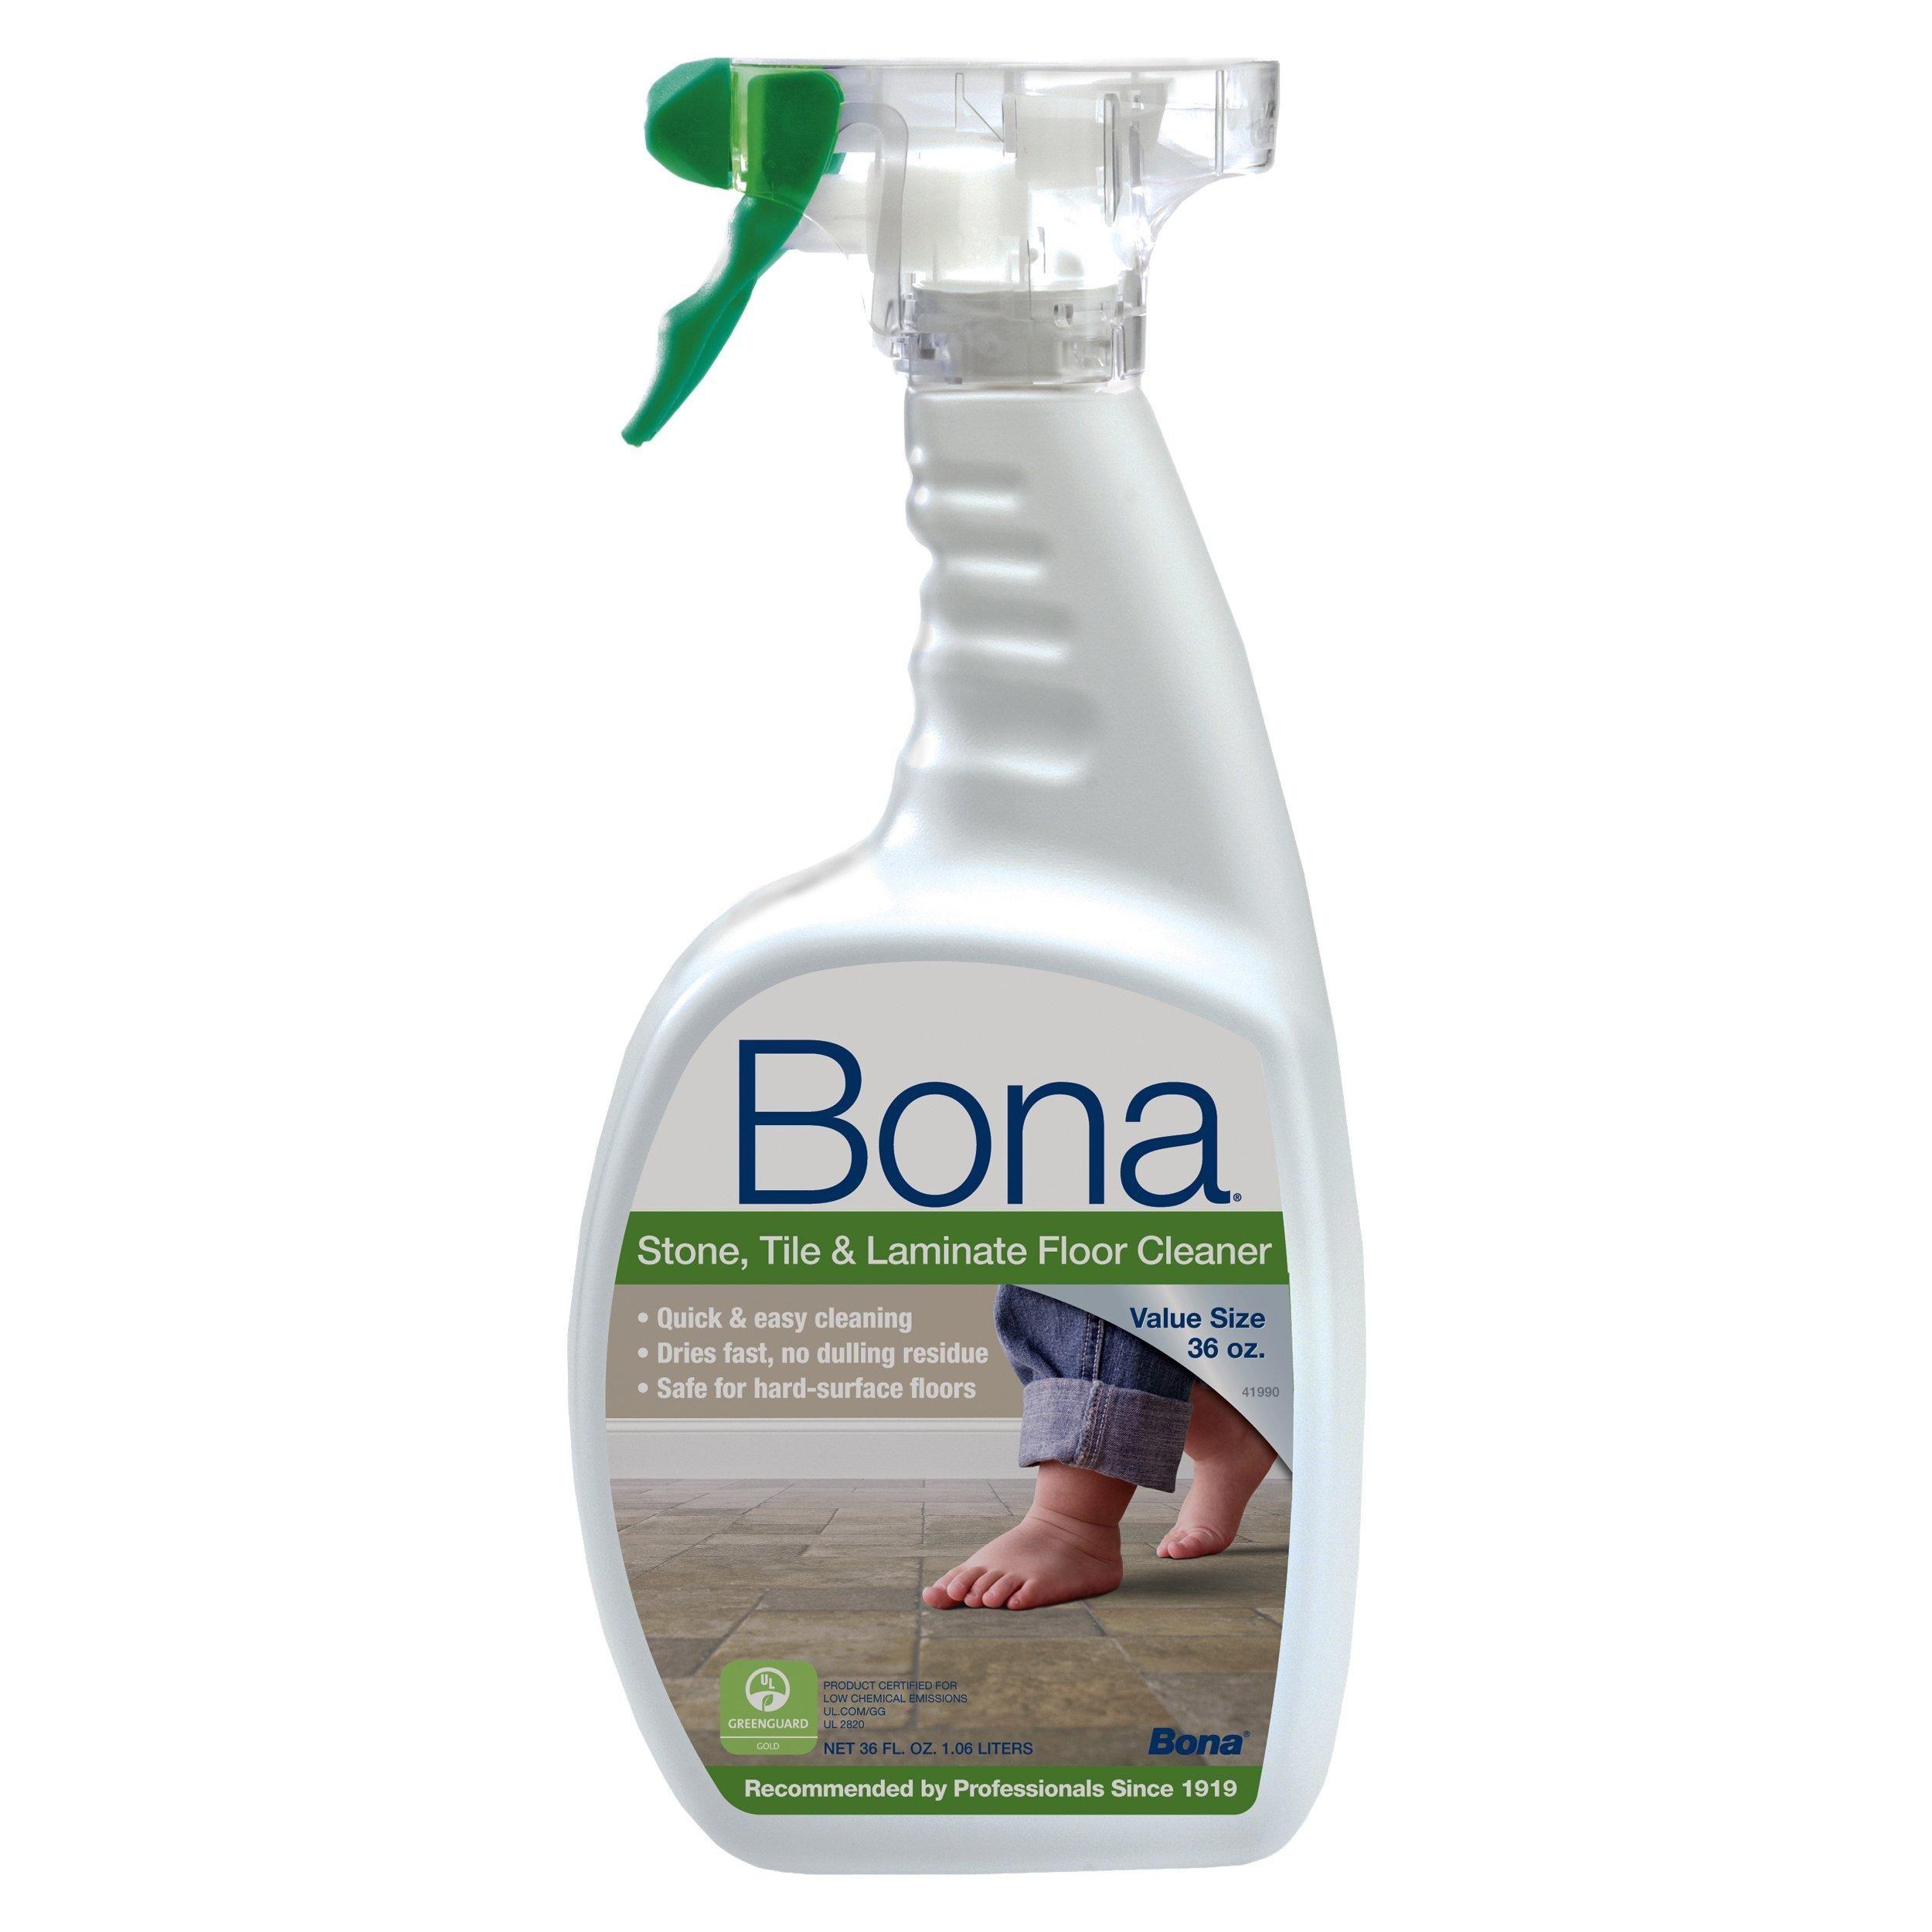 Bona Stone Tile and Laminate Floor Cleaner, 36 oz